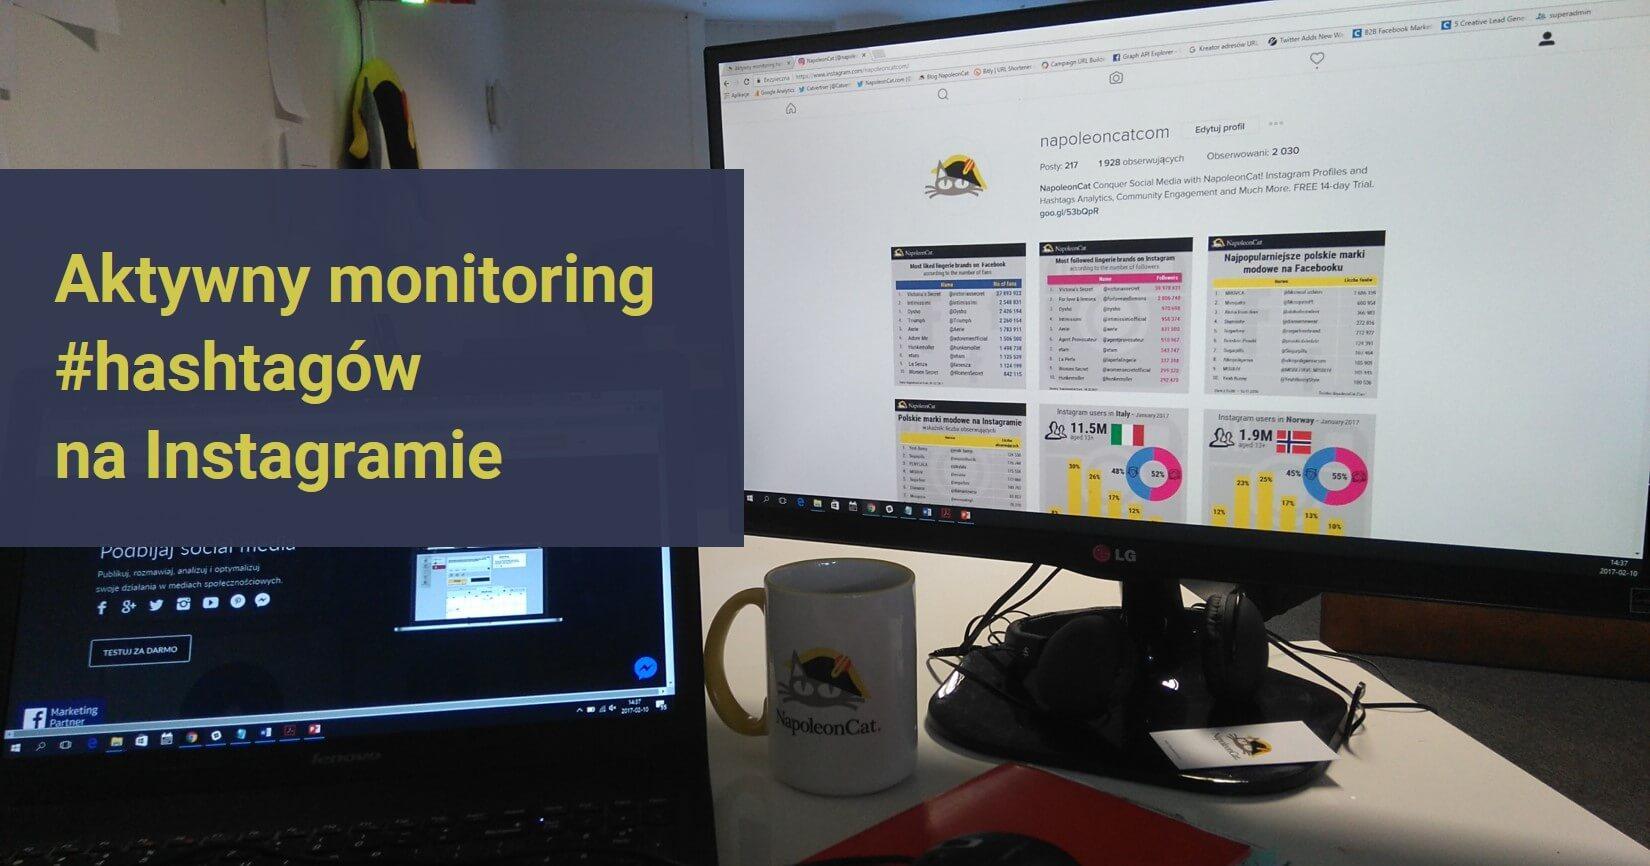 aktywny-monitoring-hashtagow-na-Instagramie-w-NapoleonCat